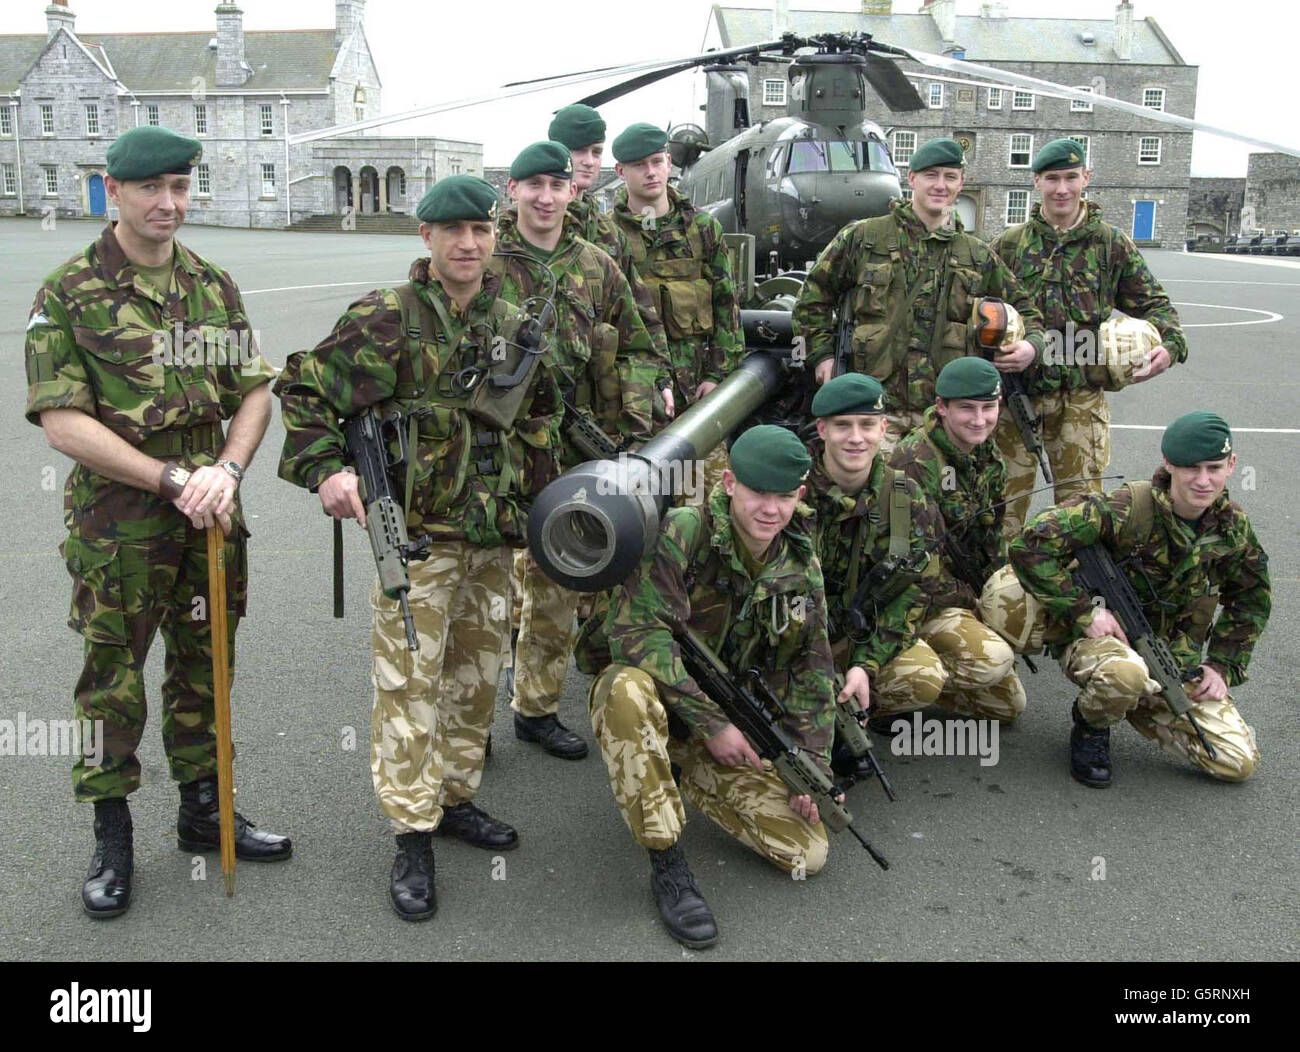 soldiers-from-29-commando-regiment-royal-artillery-G5RNXH.jpg